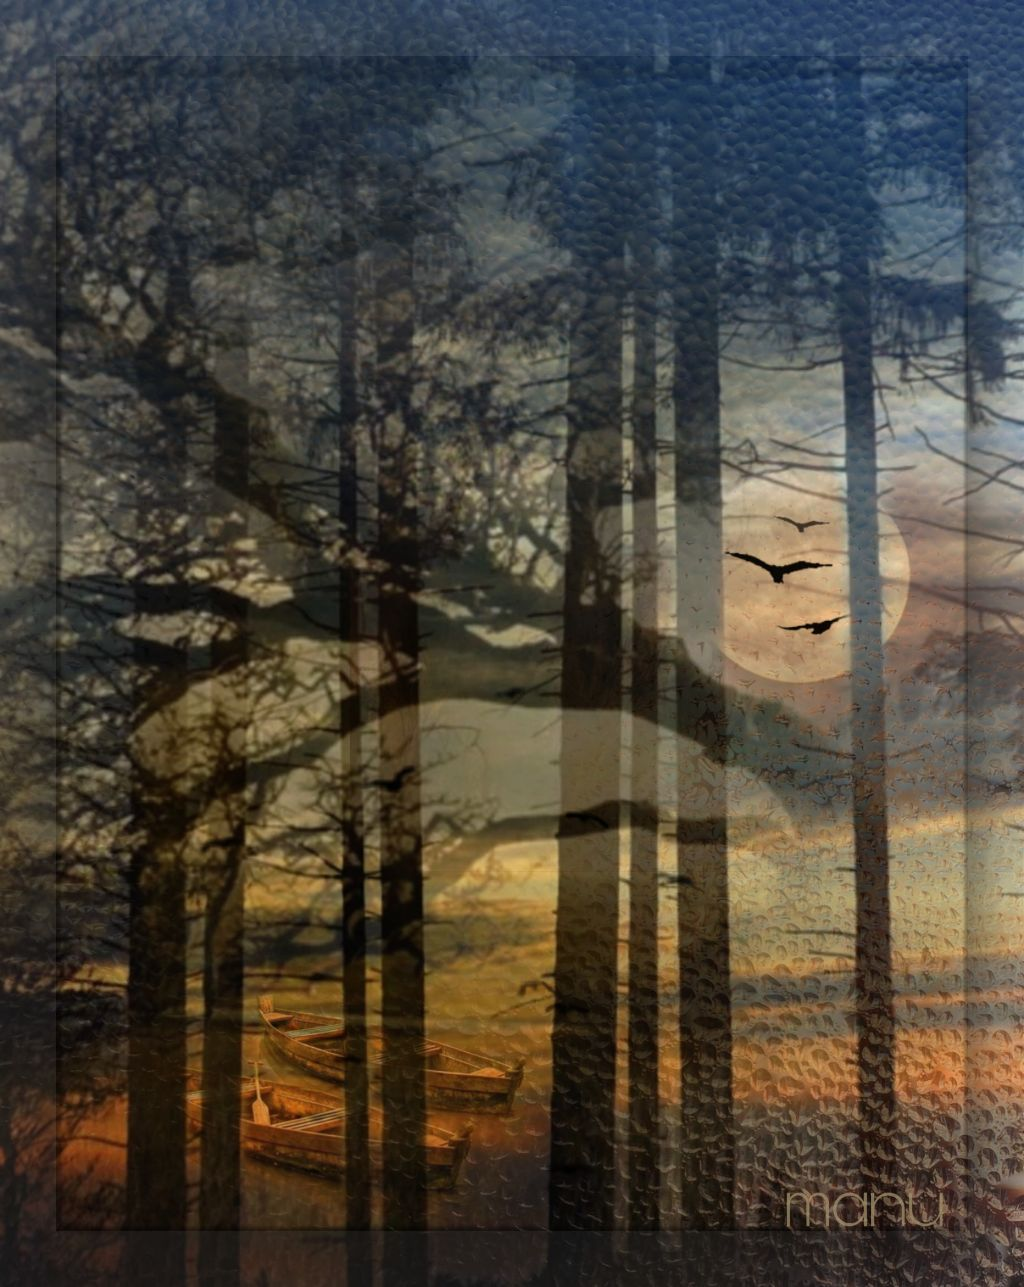 #freetoedit #myedit #landscape #fantasy  #doubleexposure #